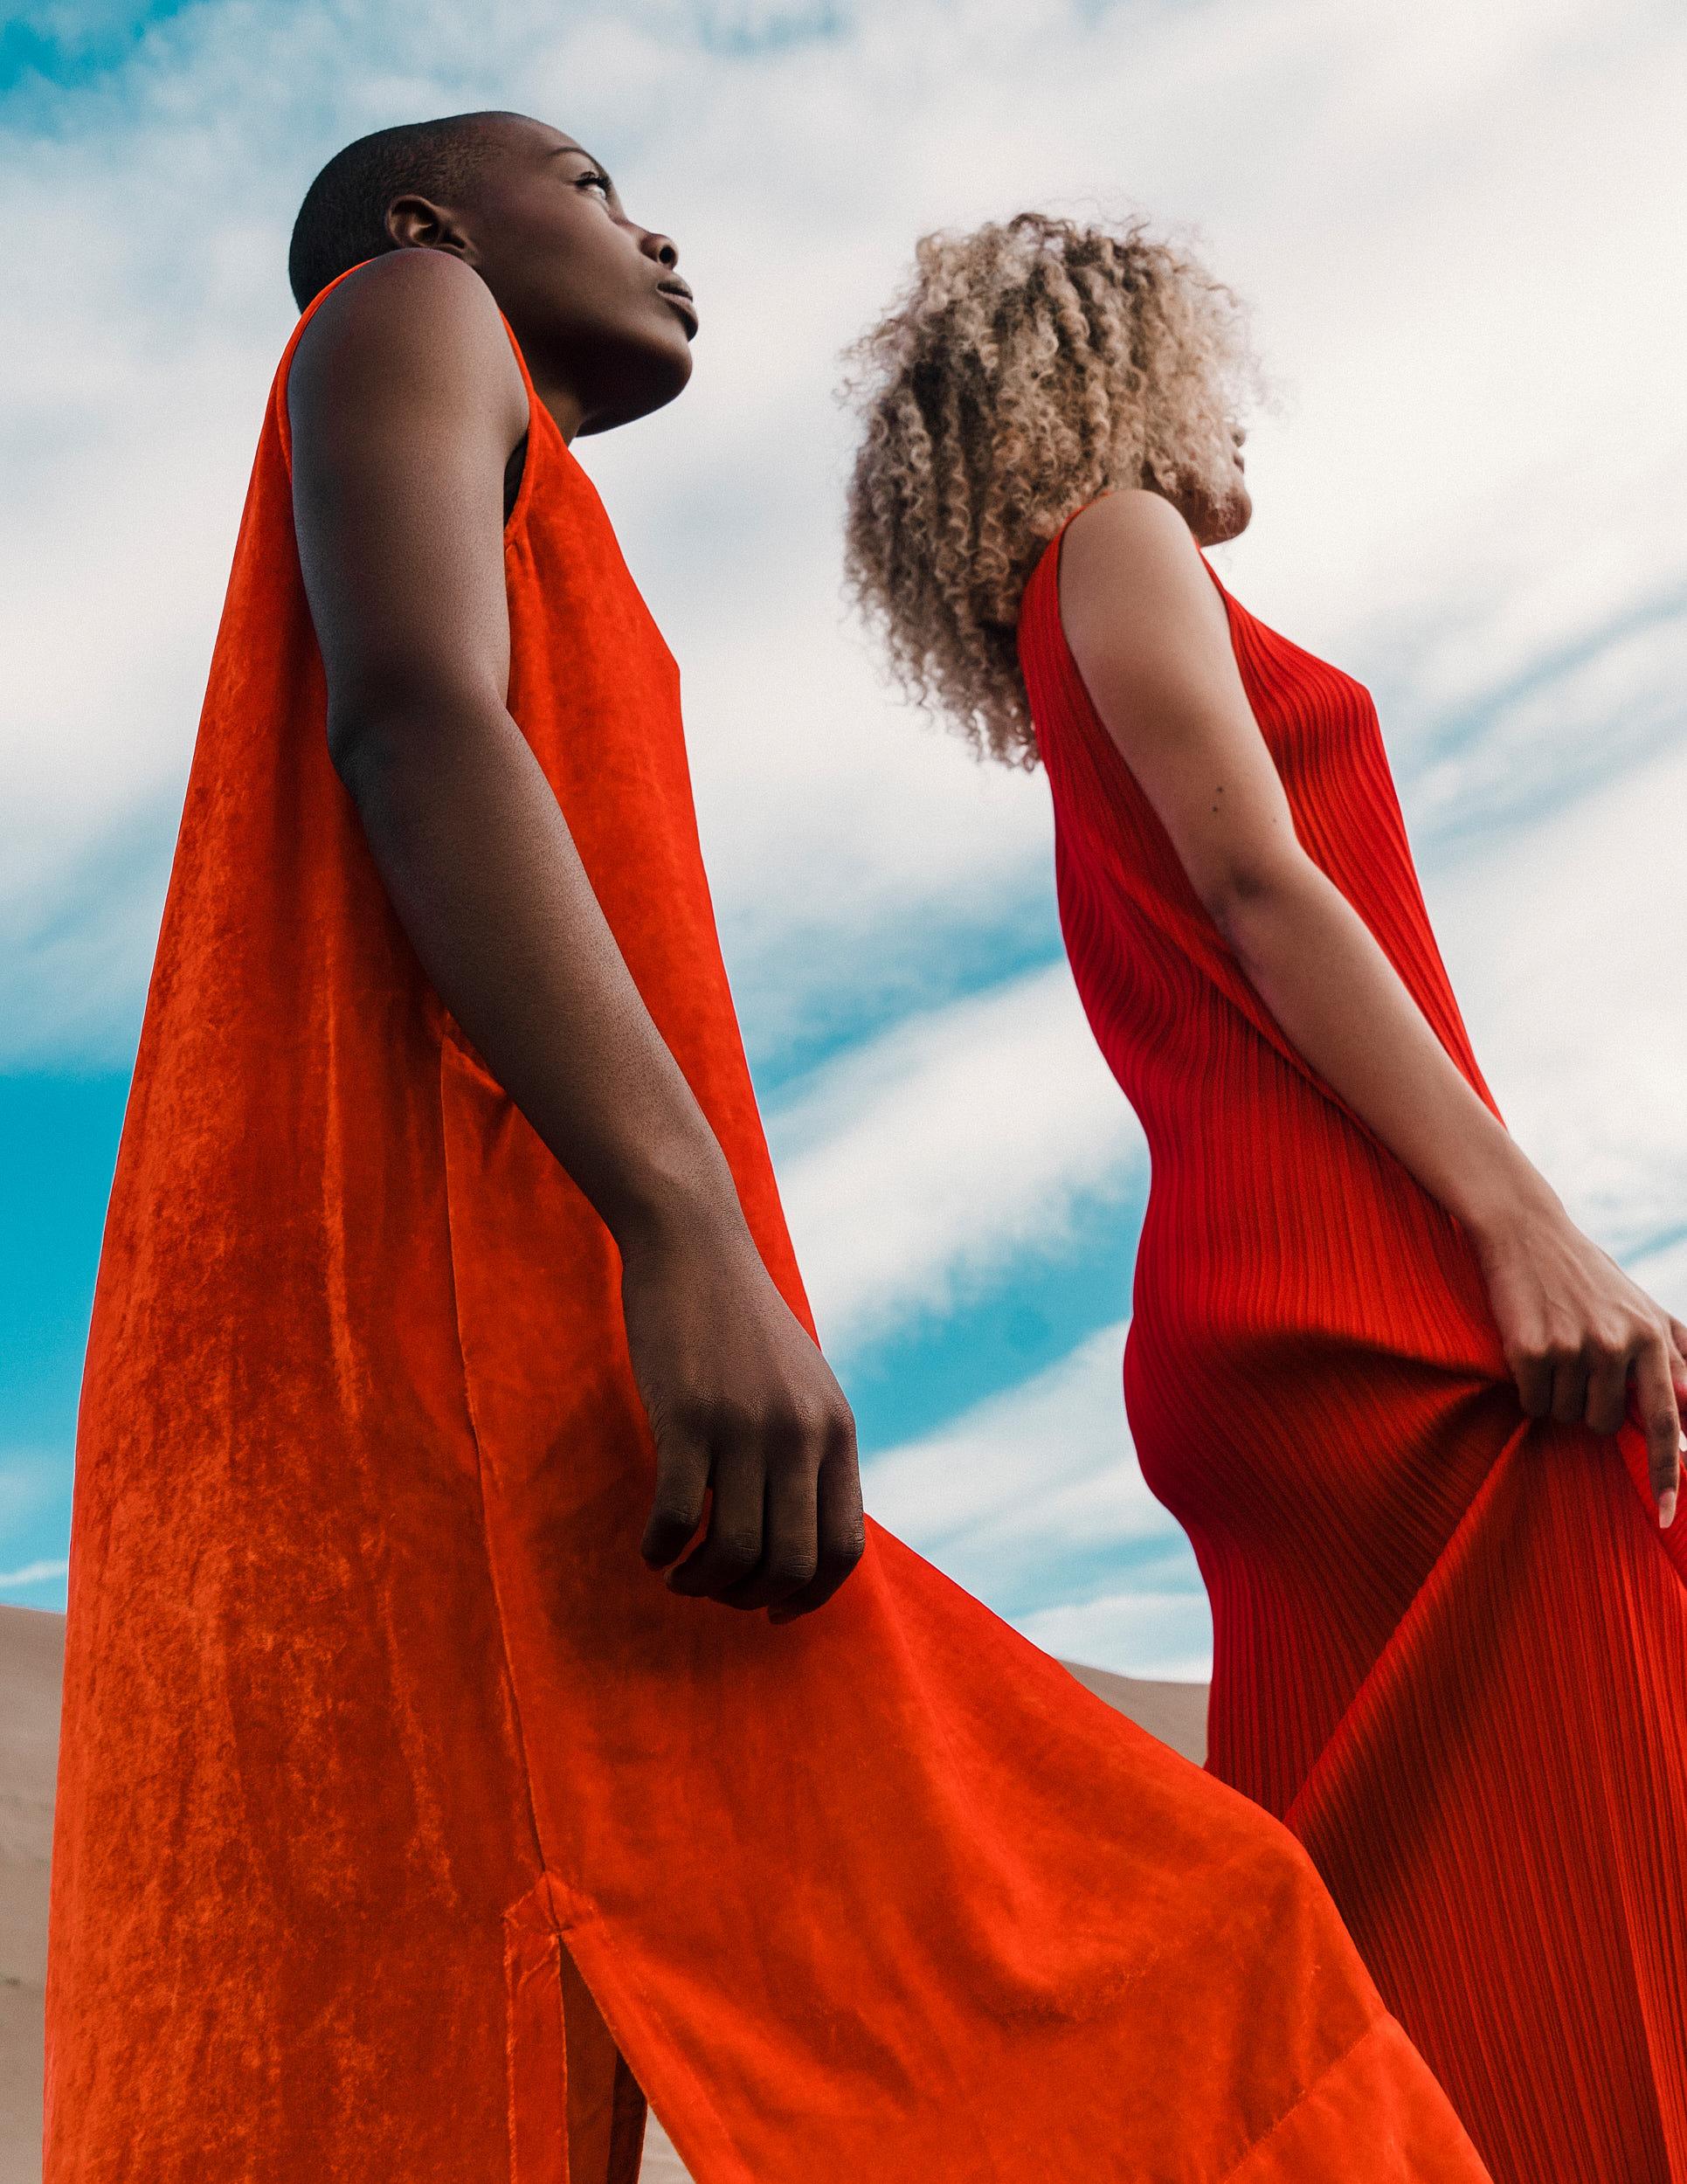 Joe Friend Photography | Fashion Photography | Boulder Lifestyle Magazine